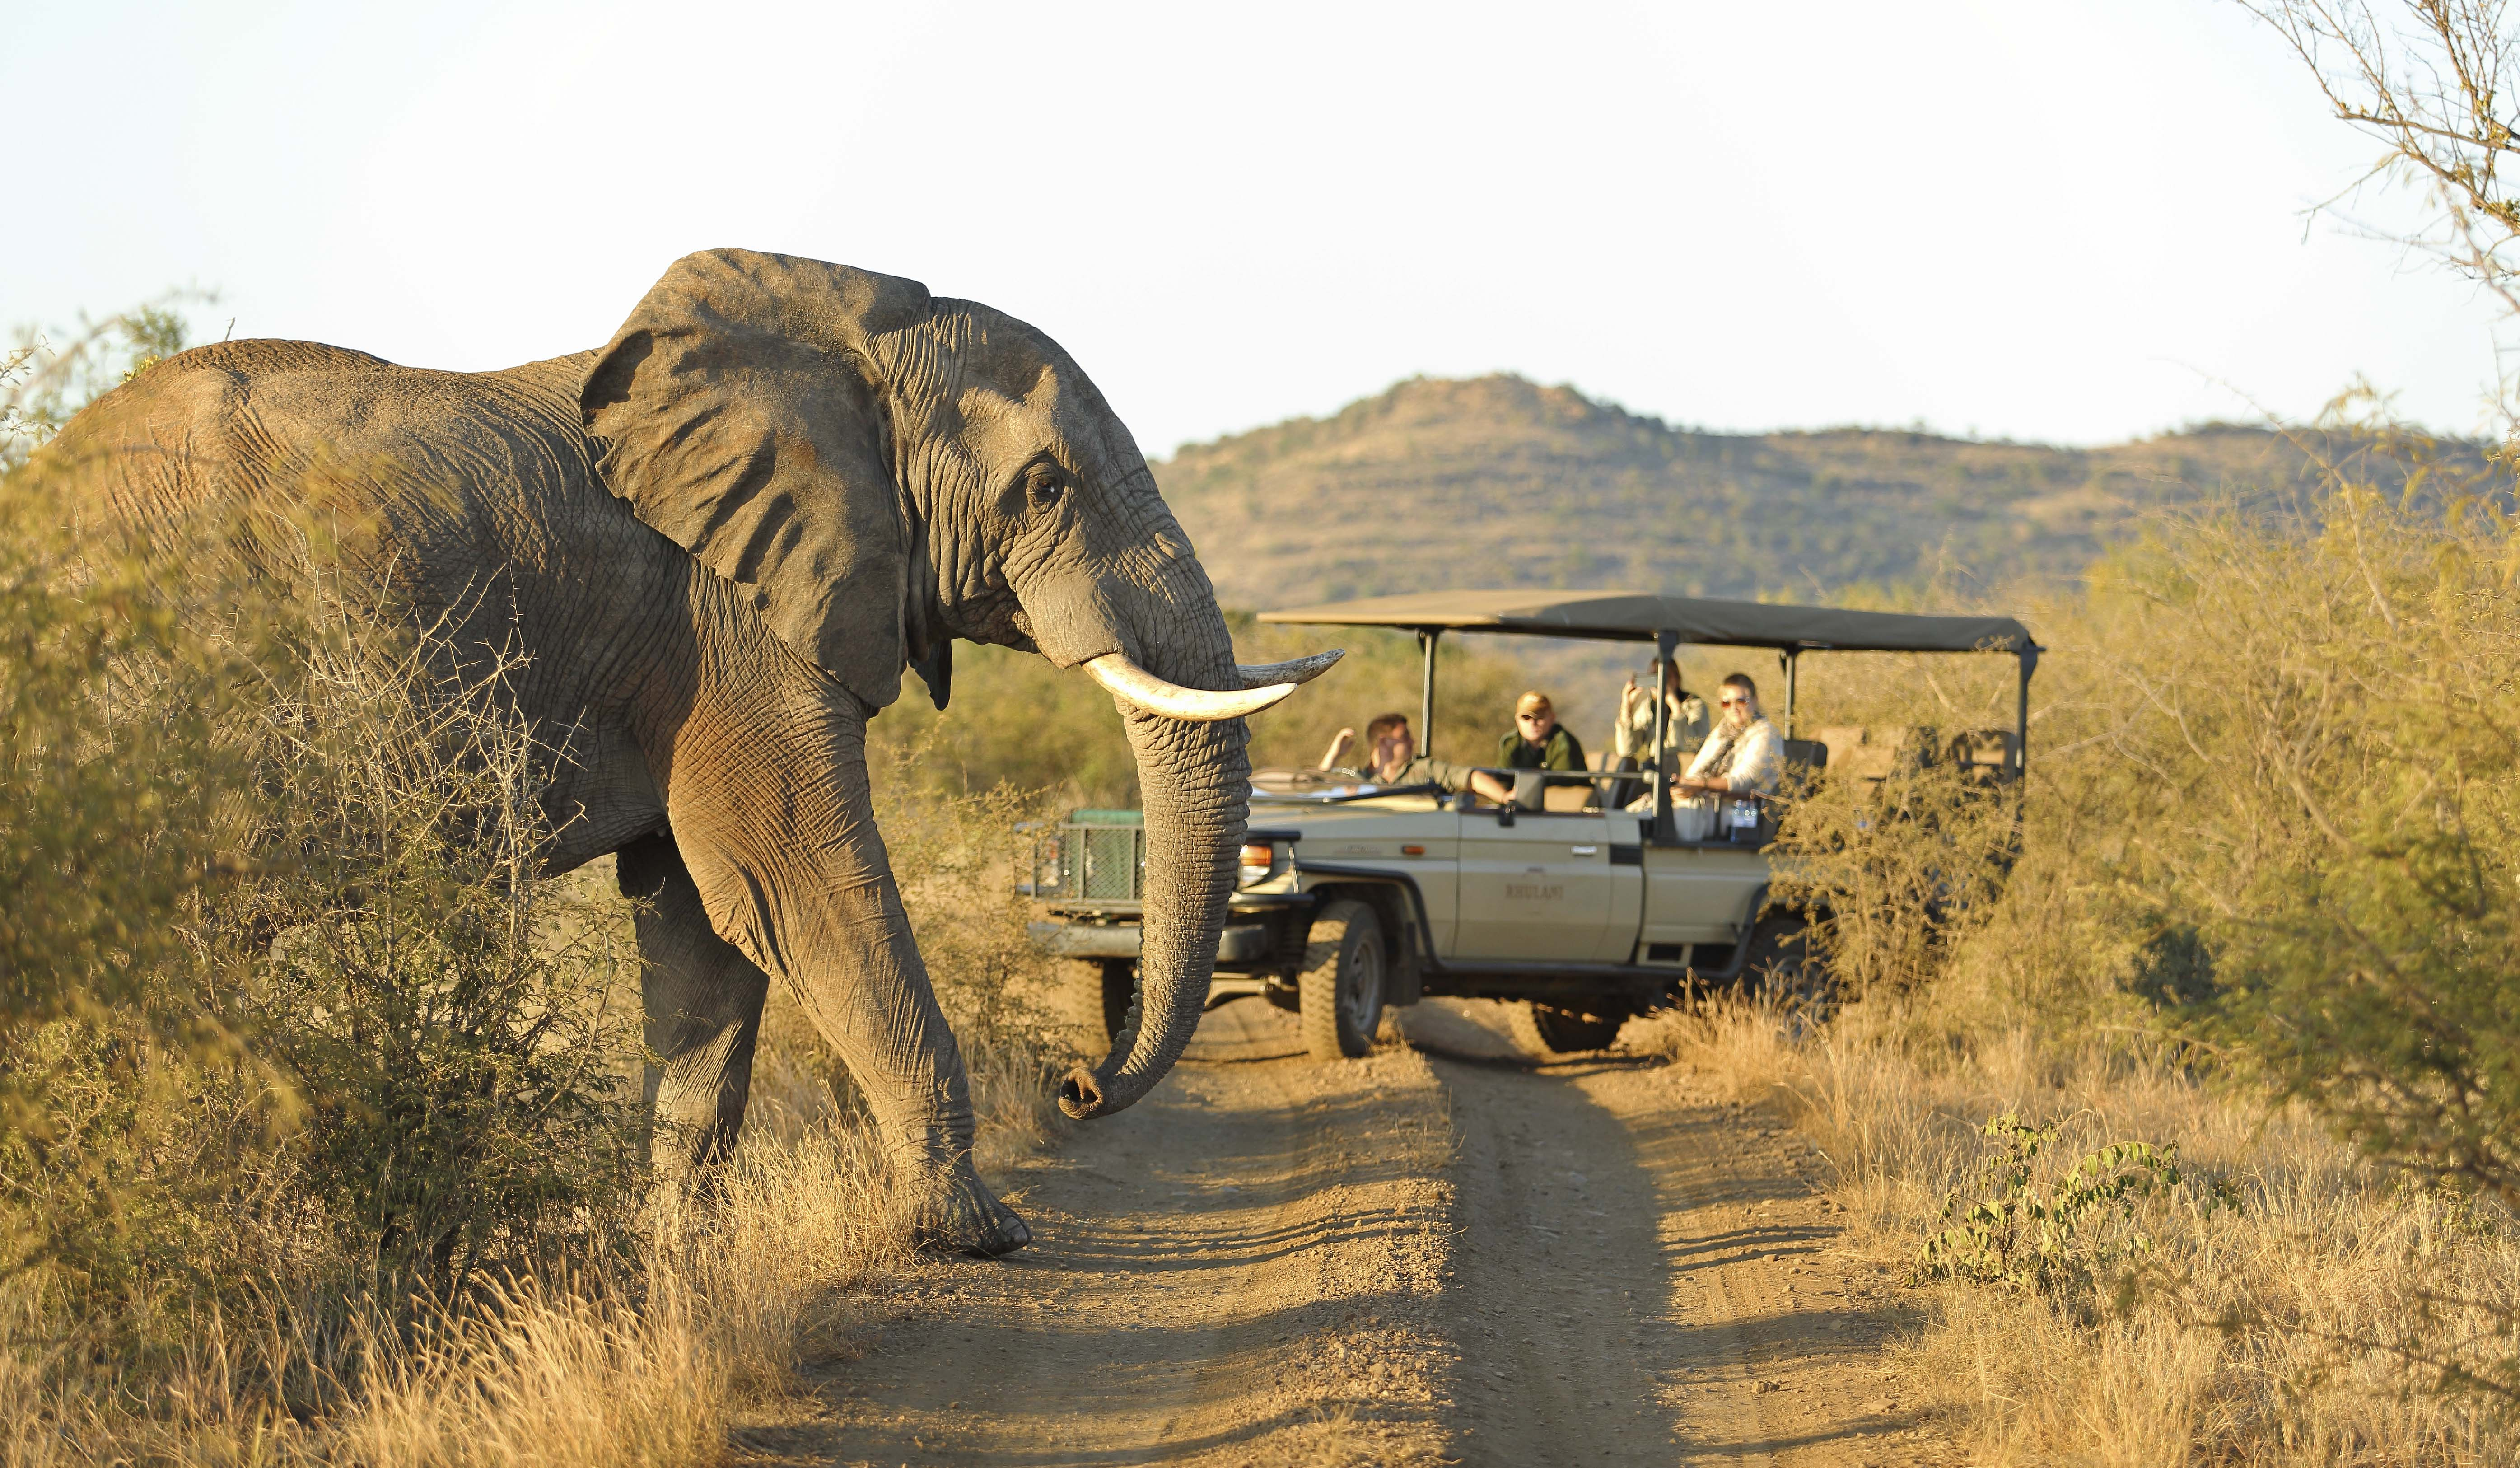 Elephants - Safari - South Africa